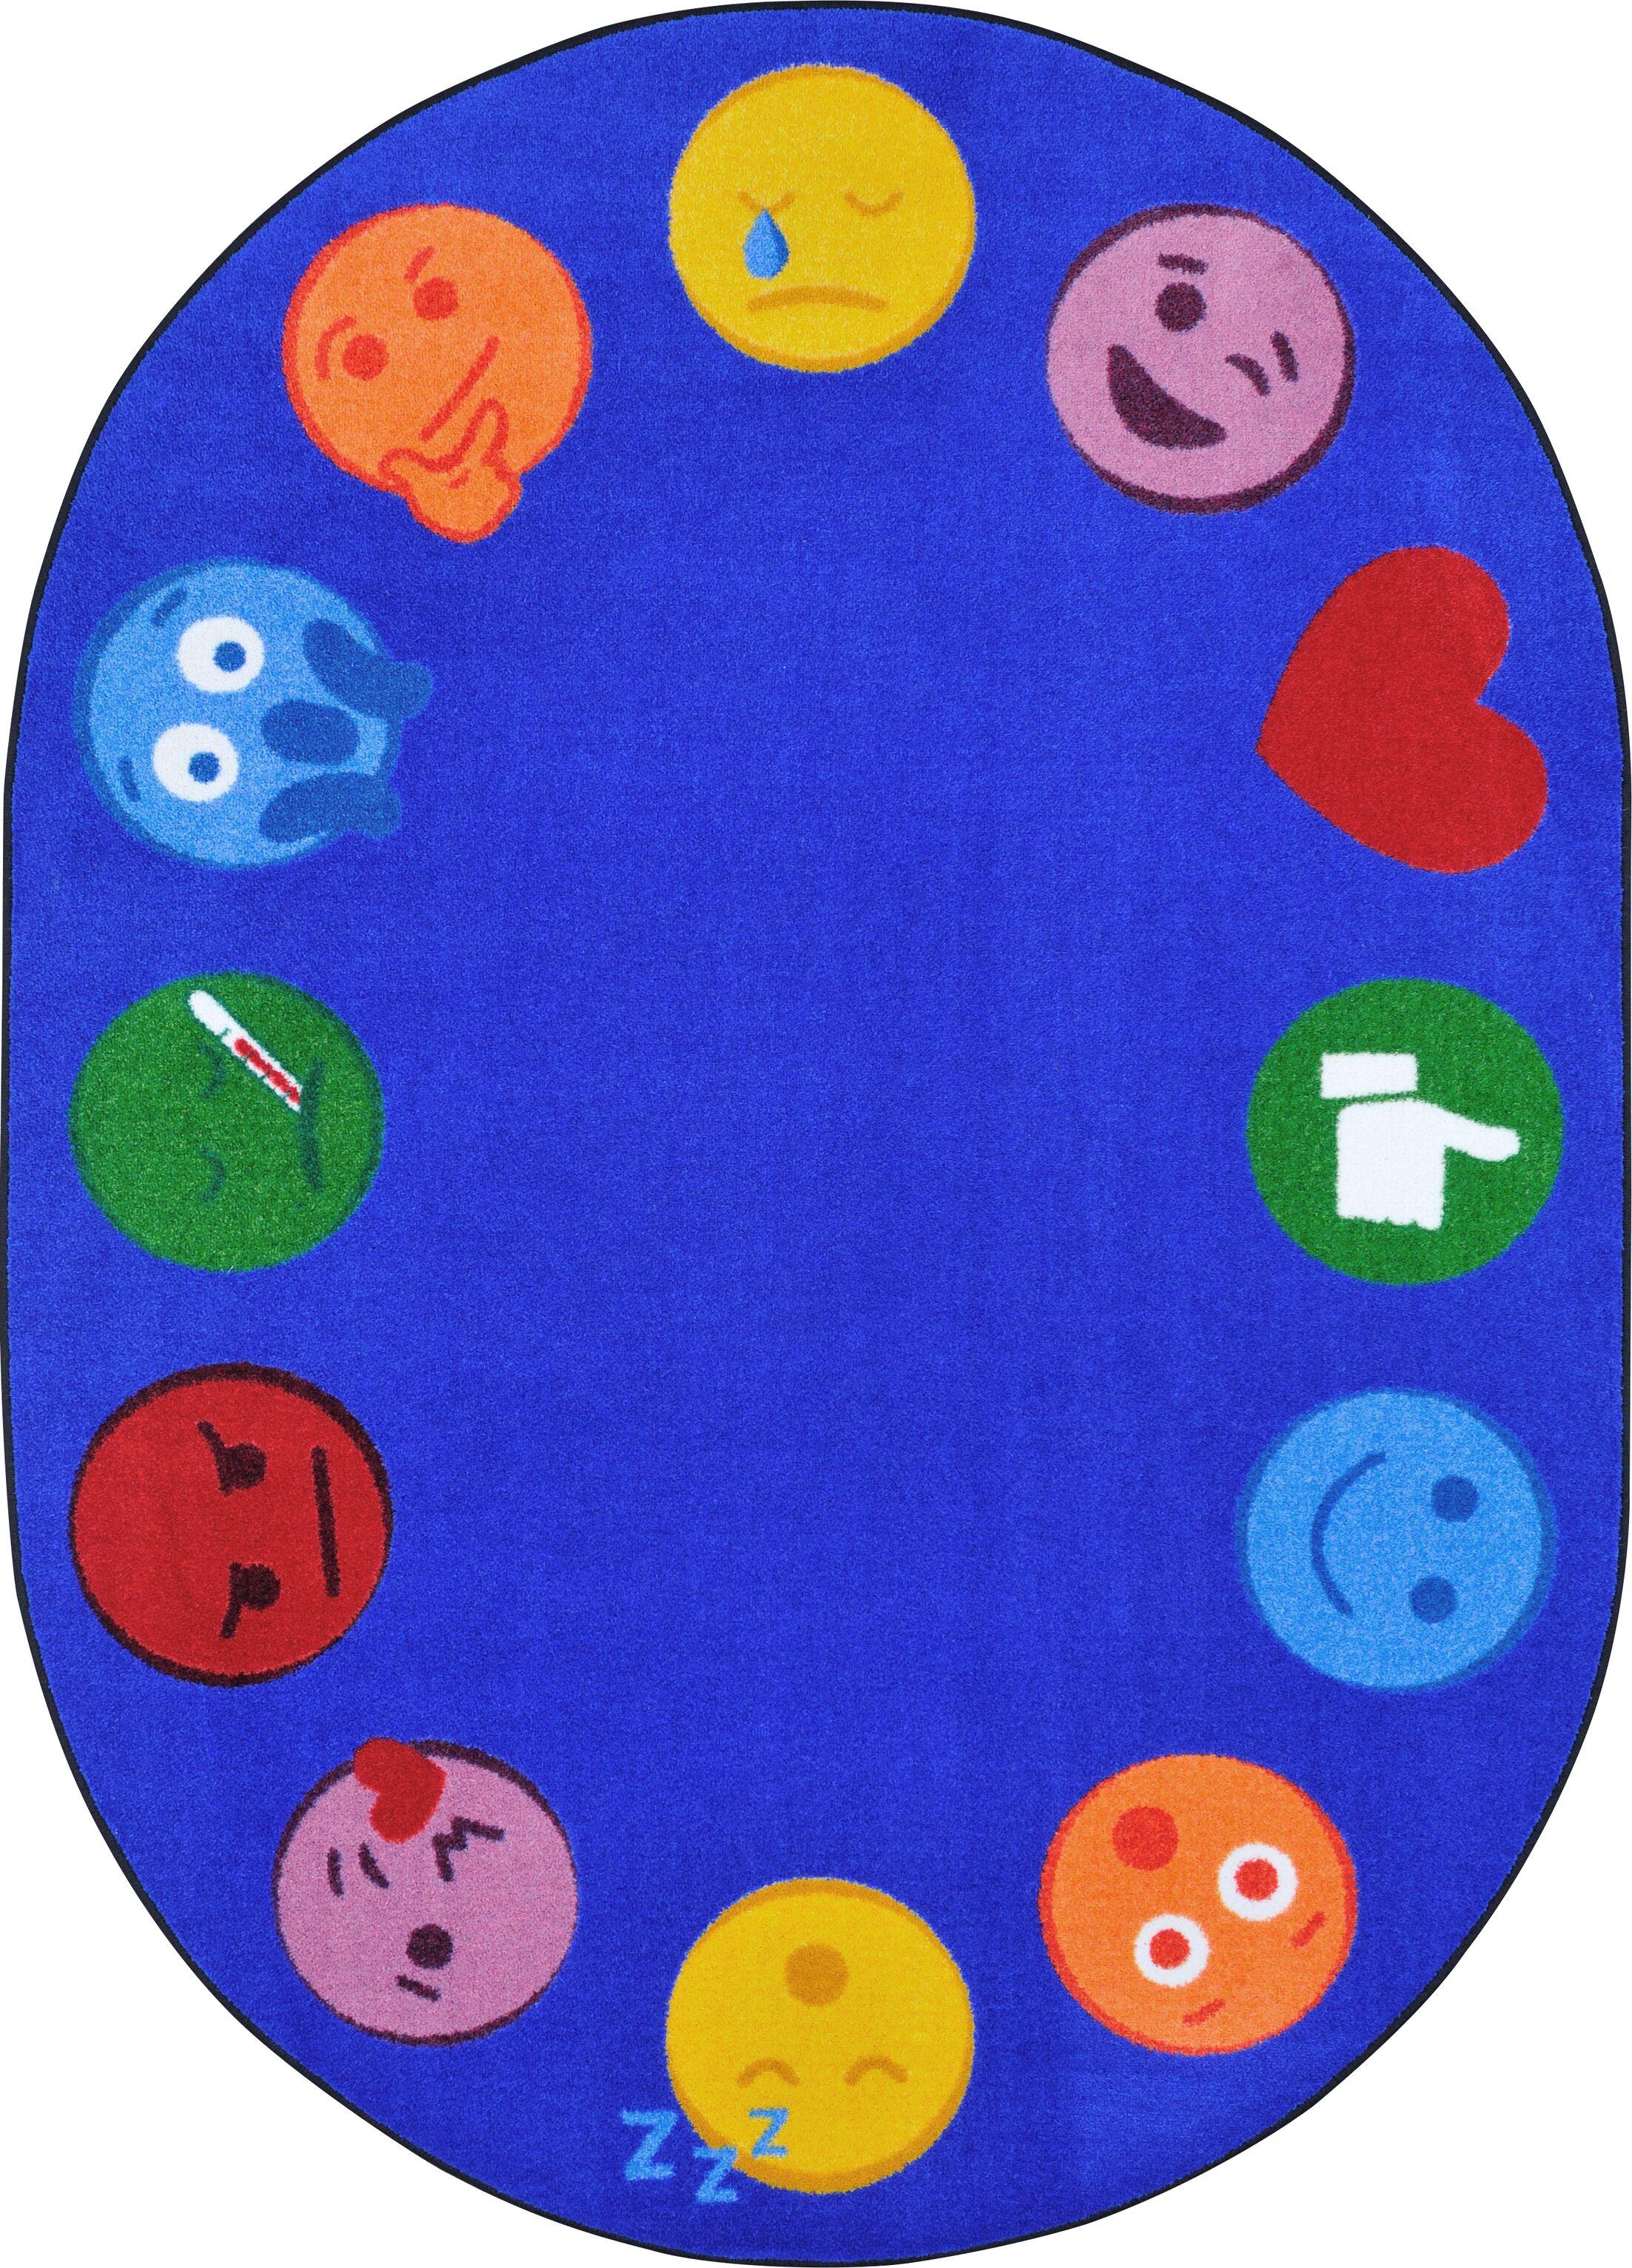 Emoji Edge Blue Area Rug Rug Size: Rectangle 5'4